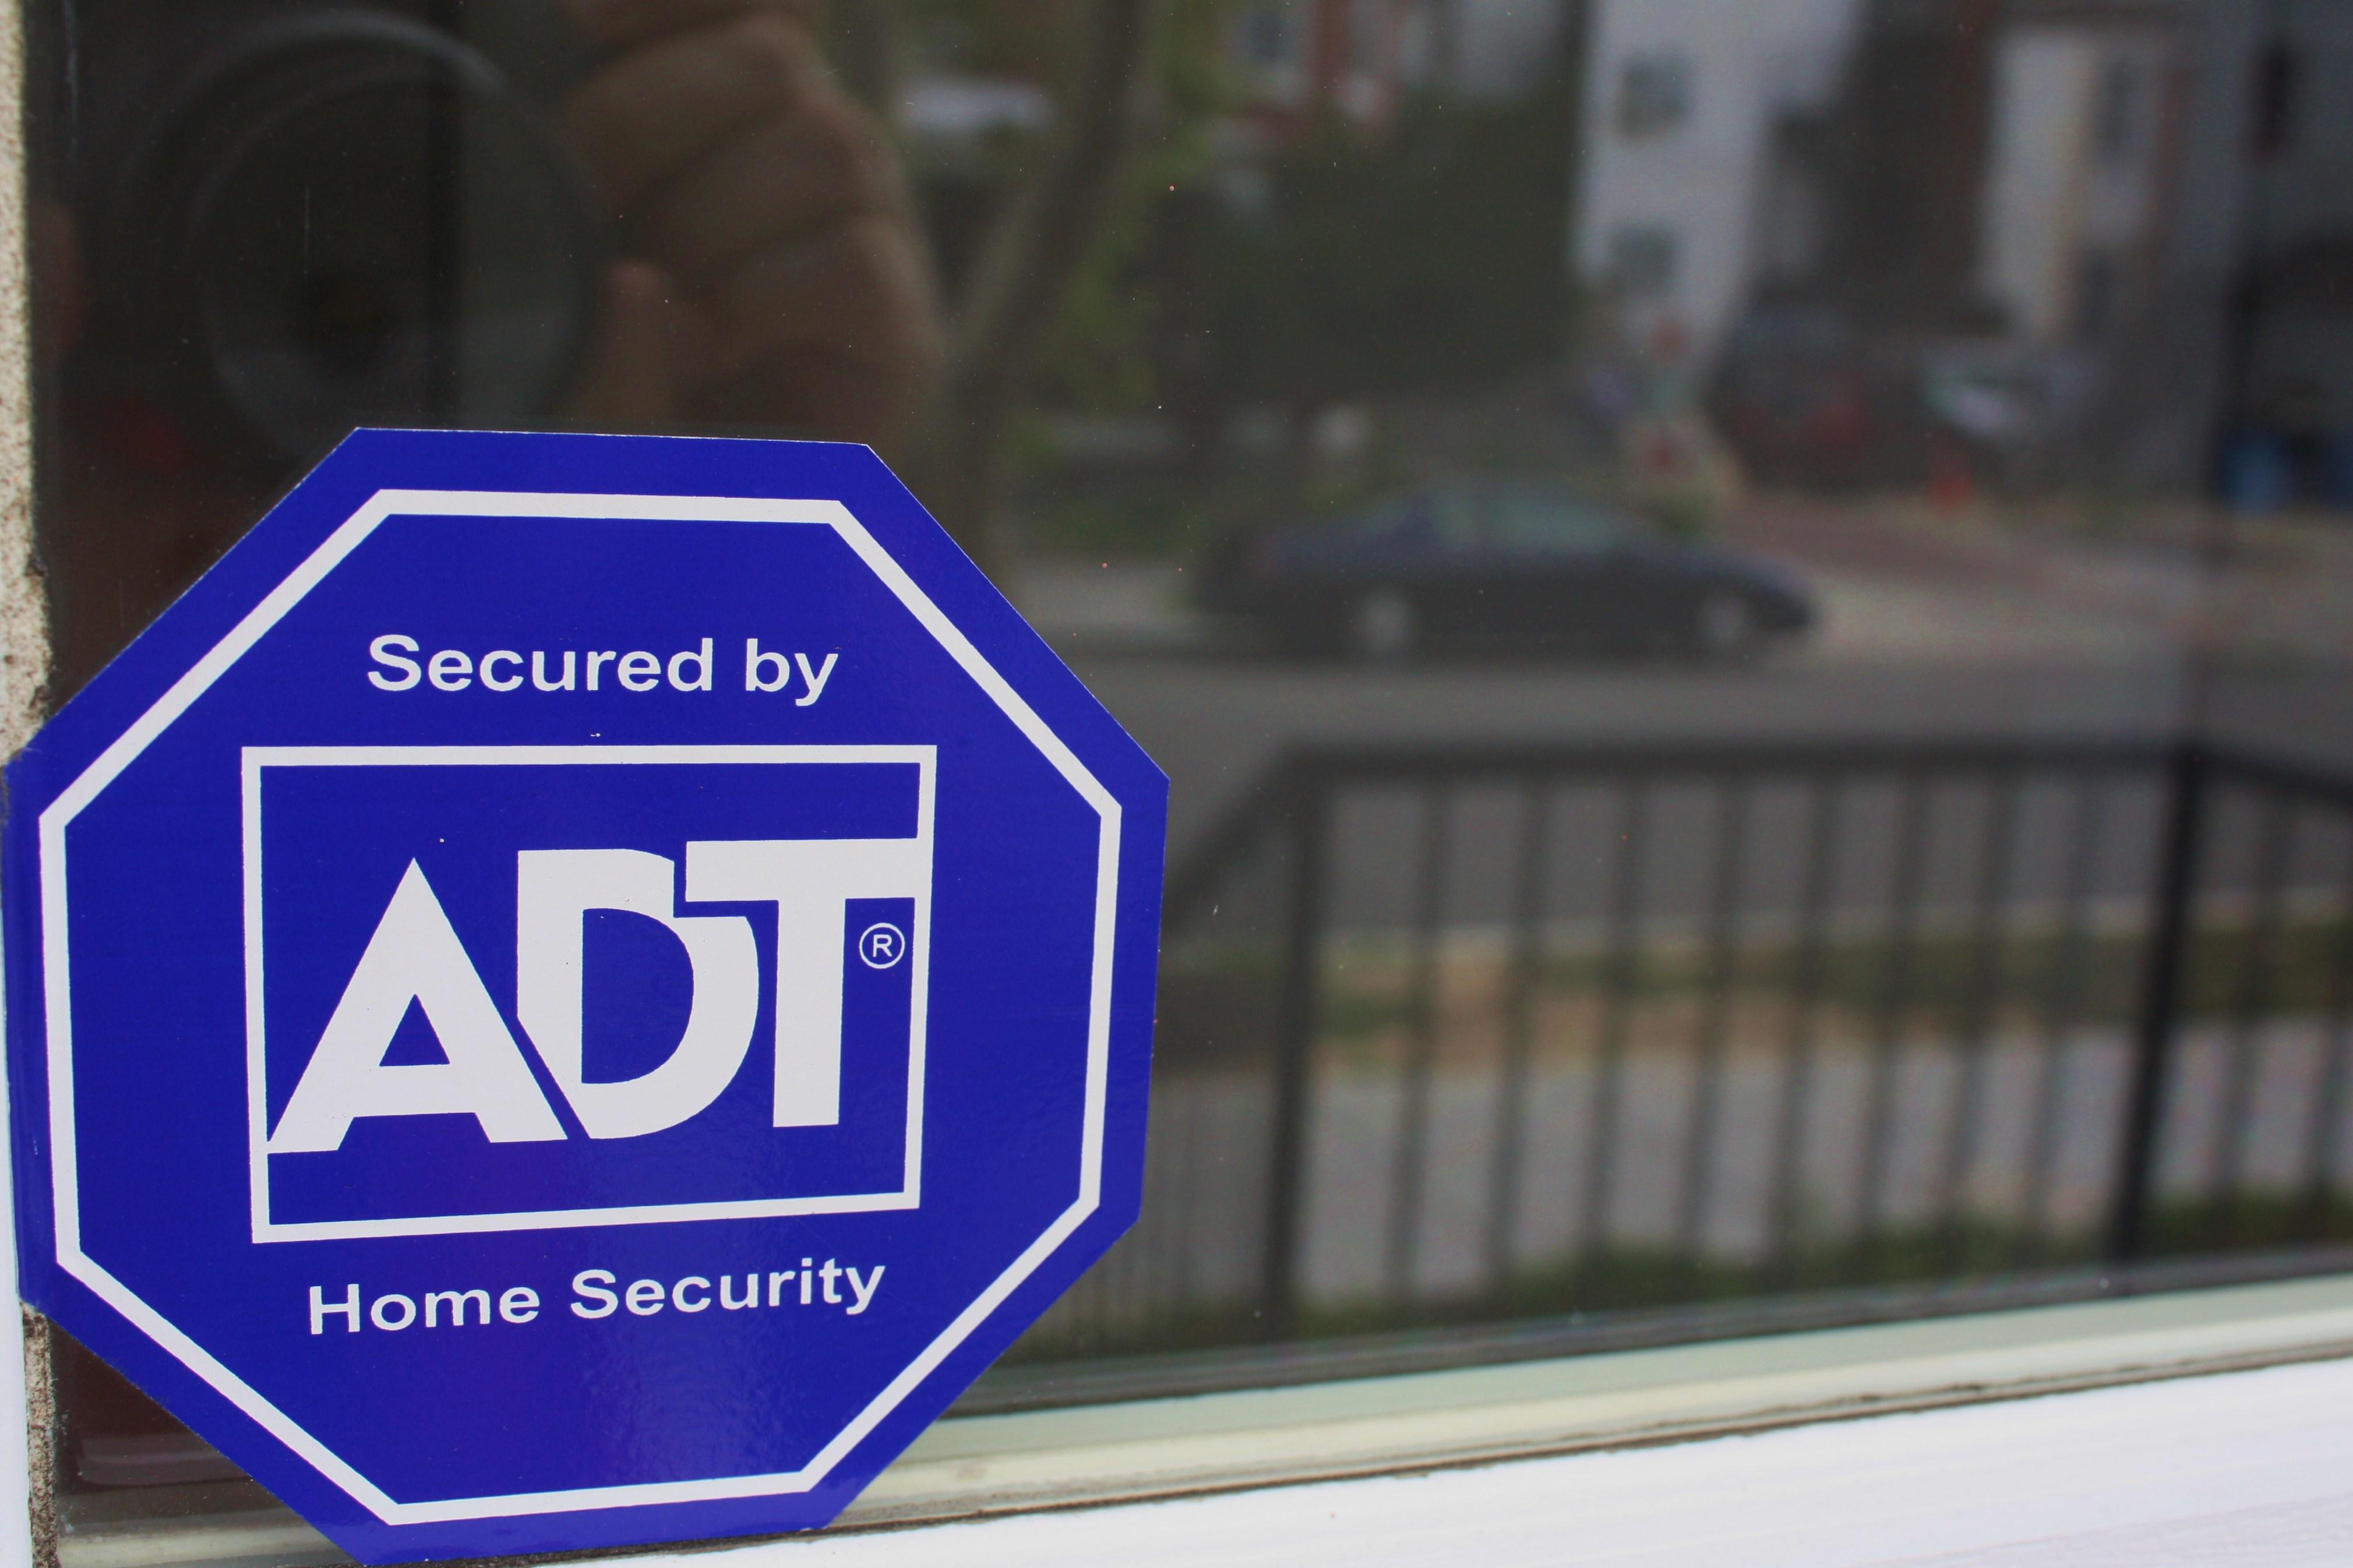 Adt Security Sticker Flickr Photo Sharing